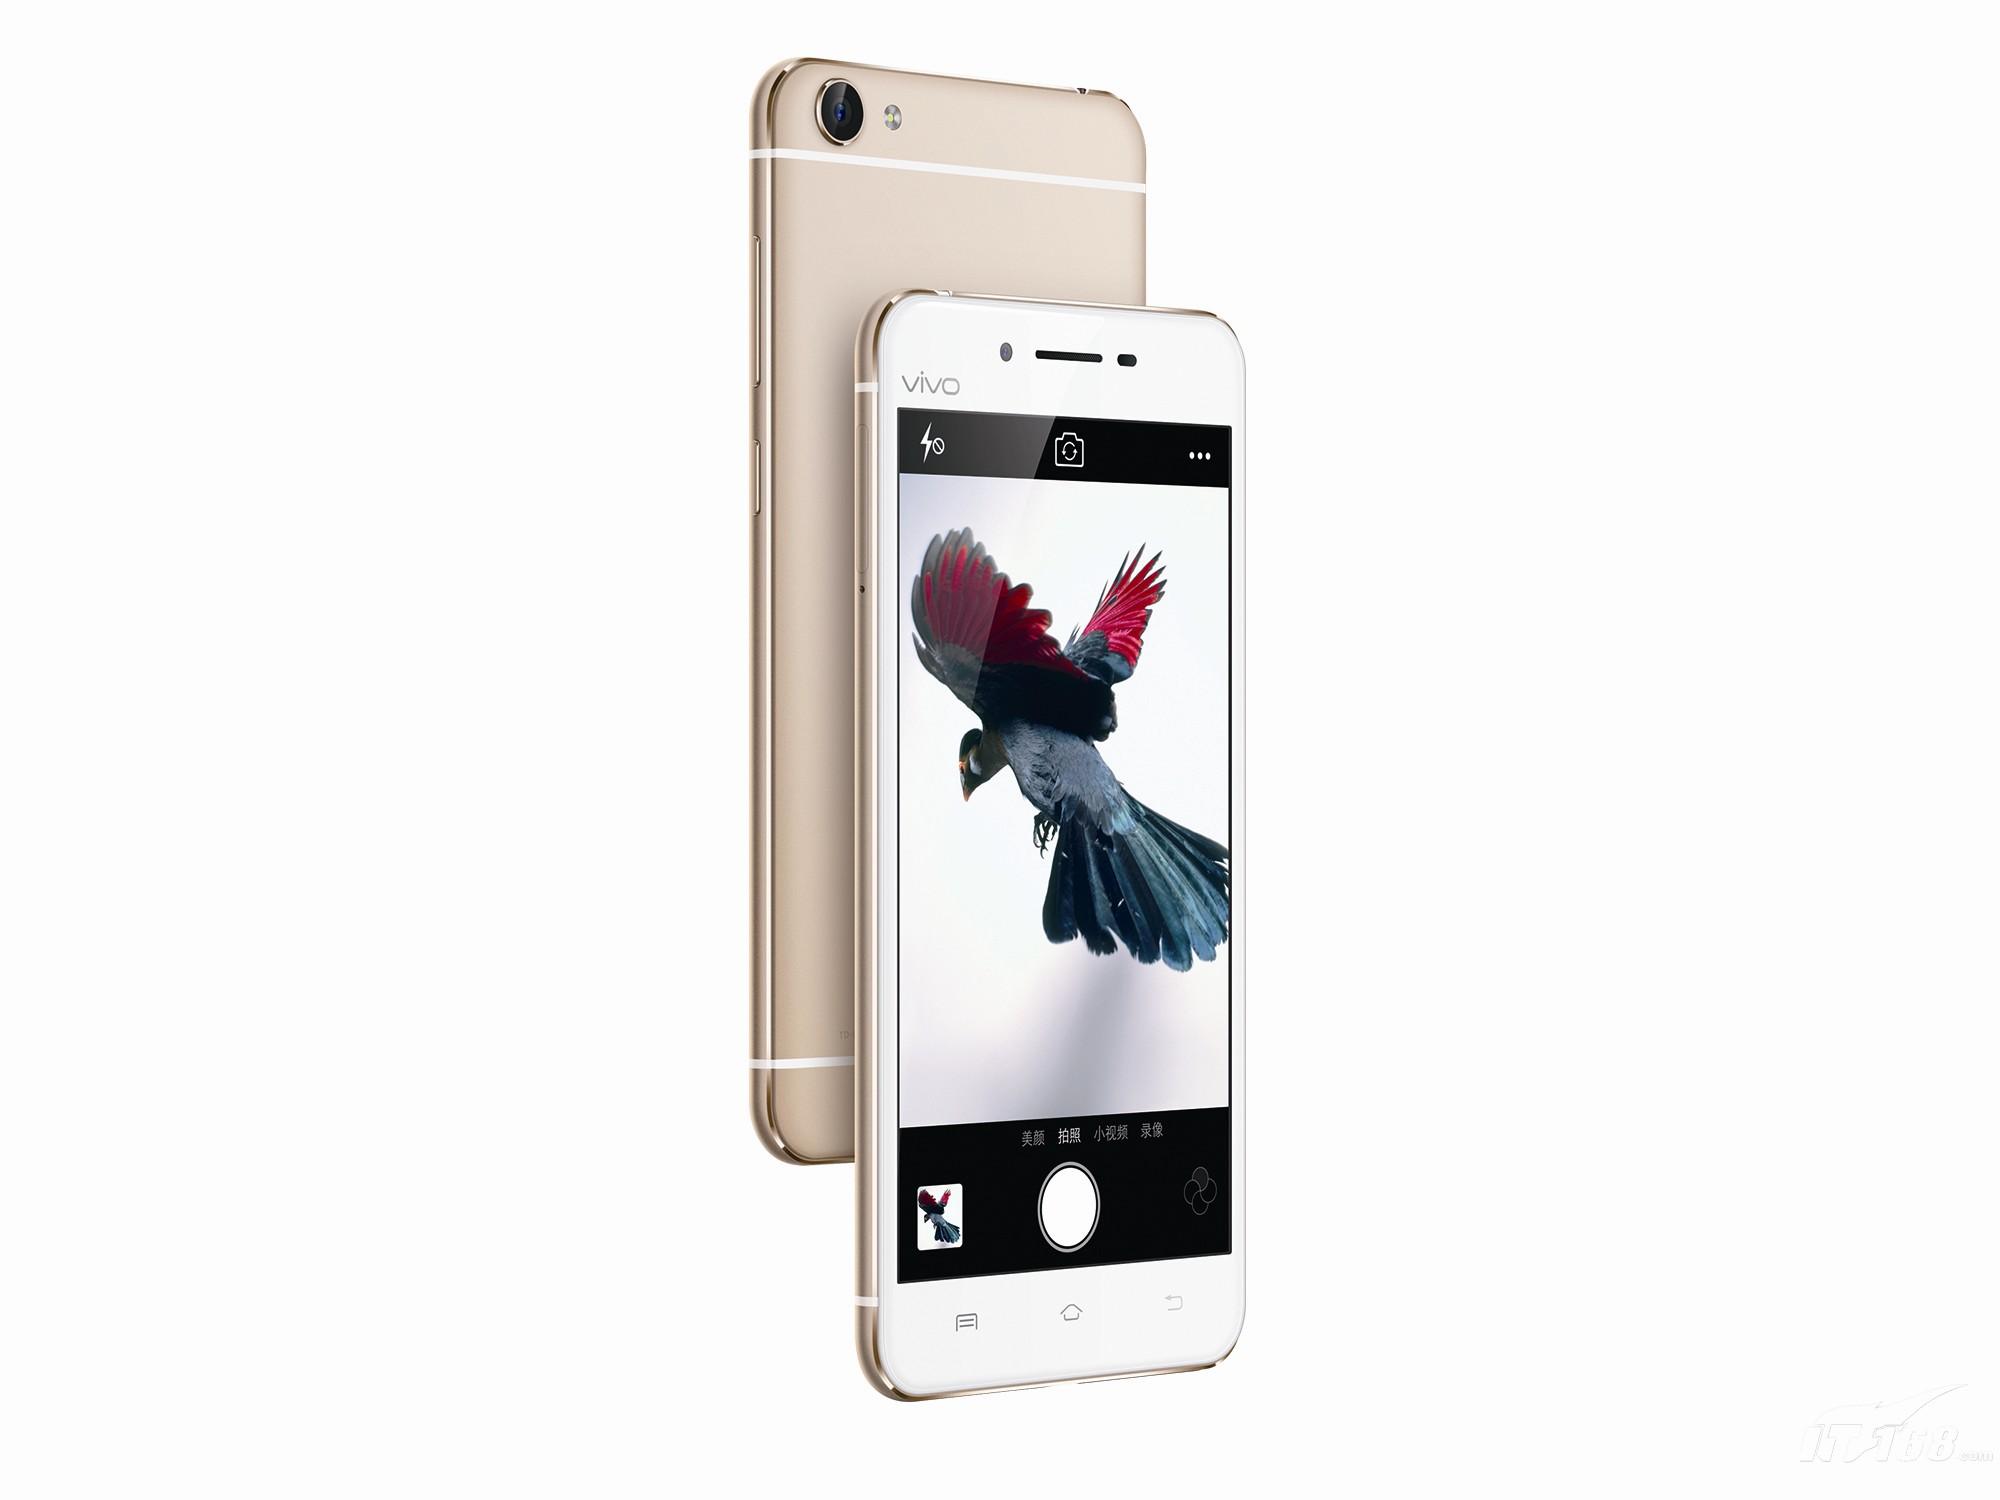 vivoX6Plus 全网通 金色手机产品图片6素材